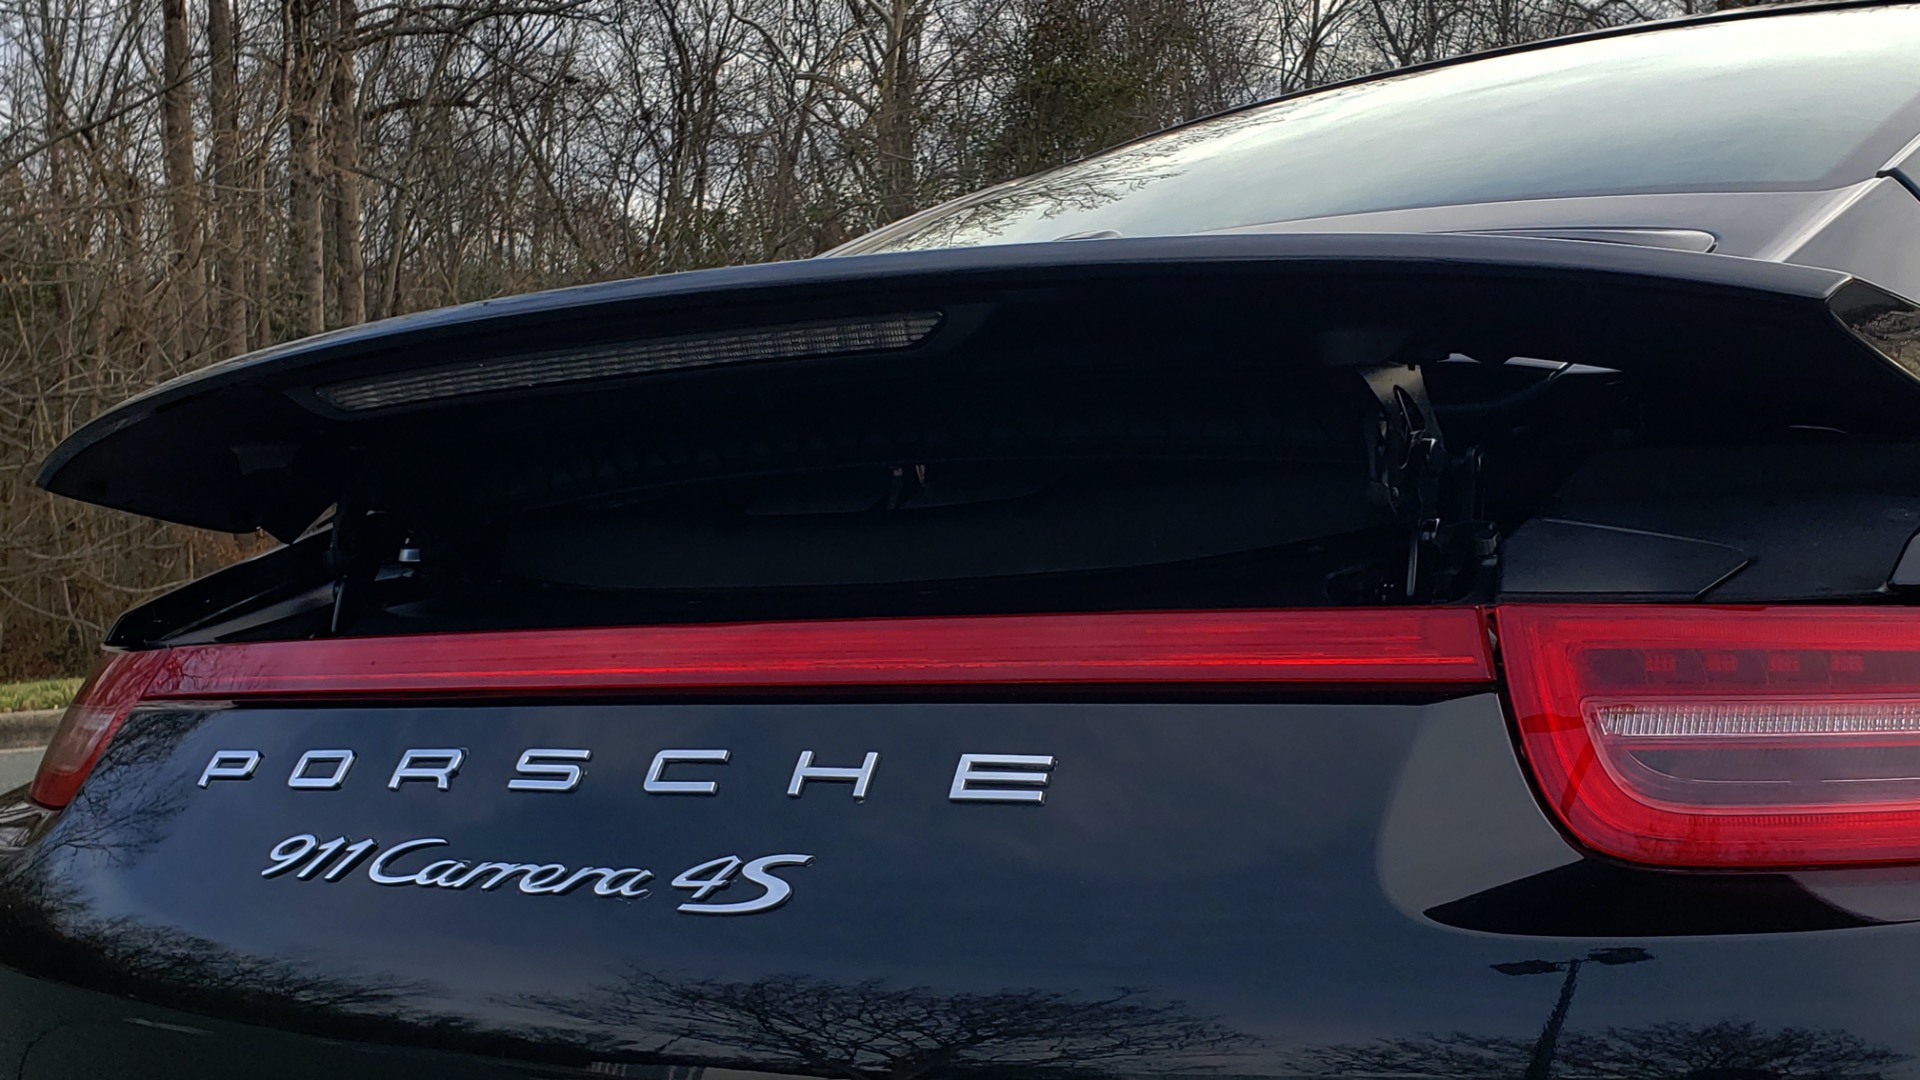 Used 2014 Porsche 911 CARRERA 4S / PREM PKG PLUS / NAV / SUNROO / BOSE / CHRONO for sale Sold at Formula Imports in Charlotte NC 28227 20